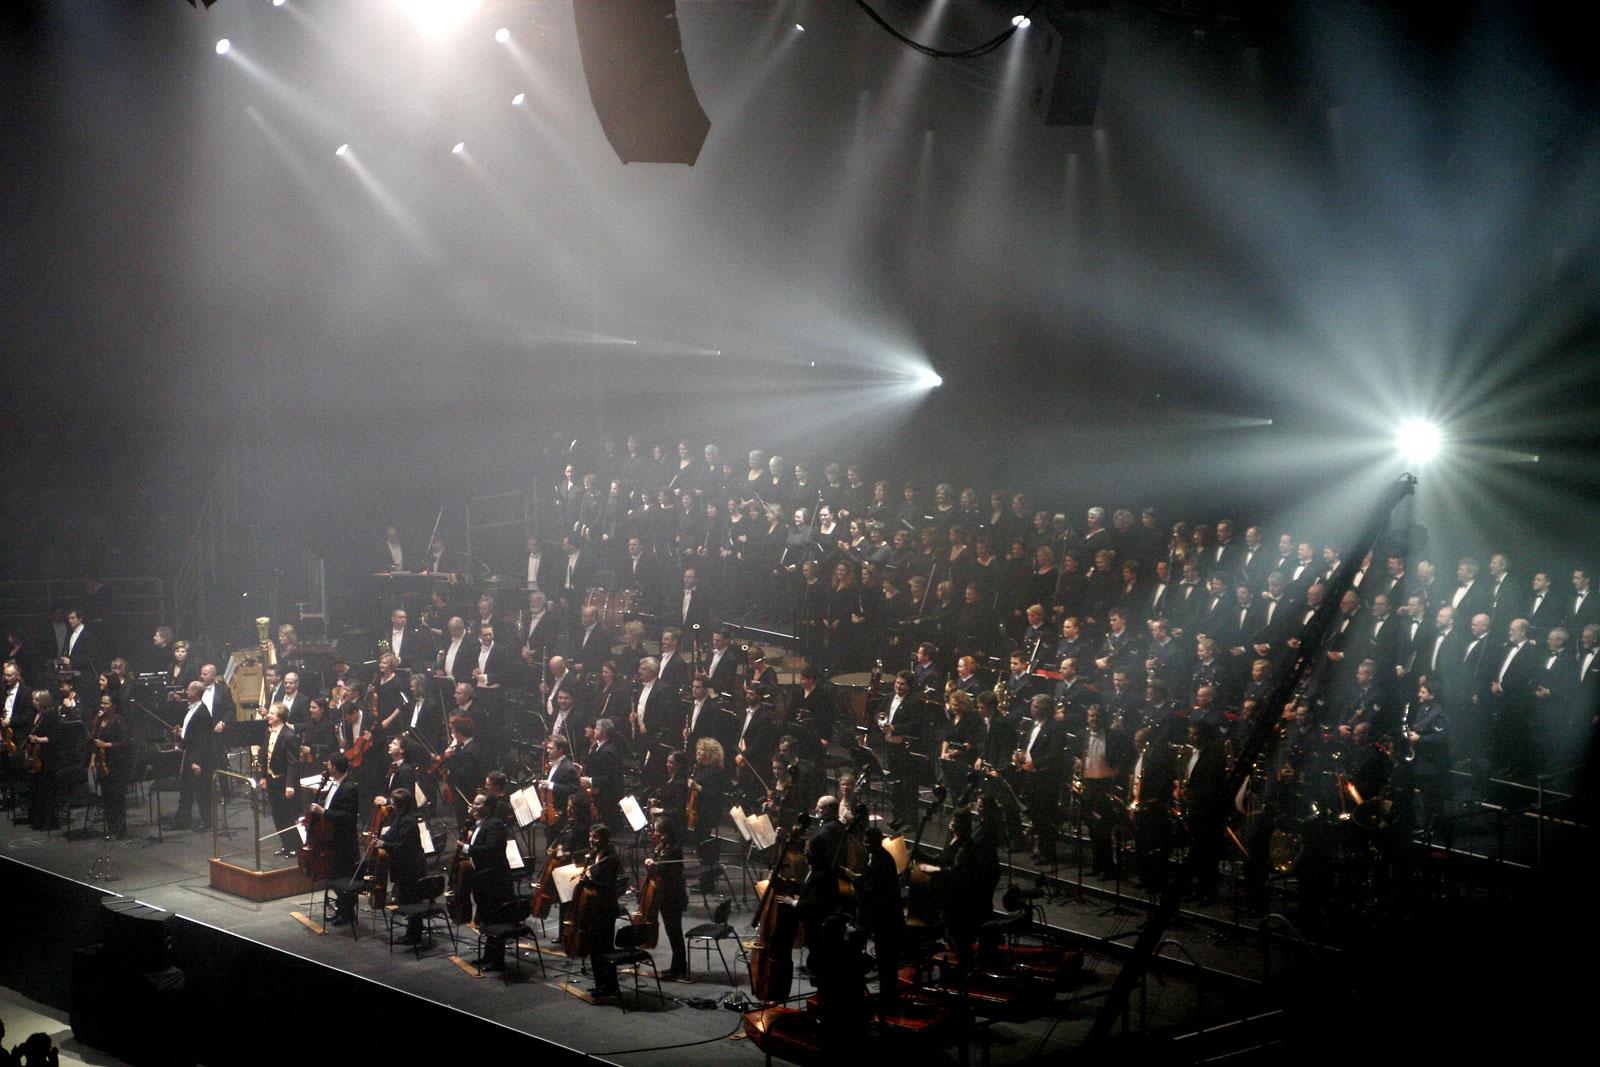 Melb_symphony_orchestra